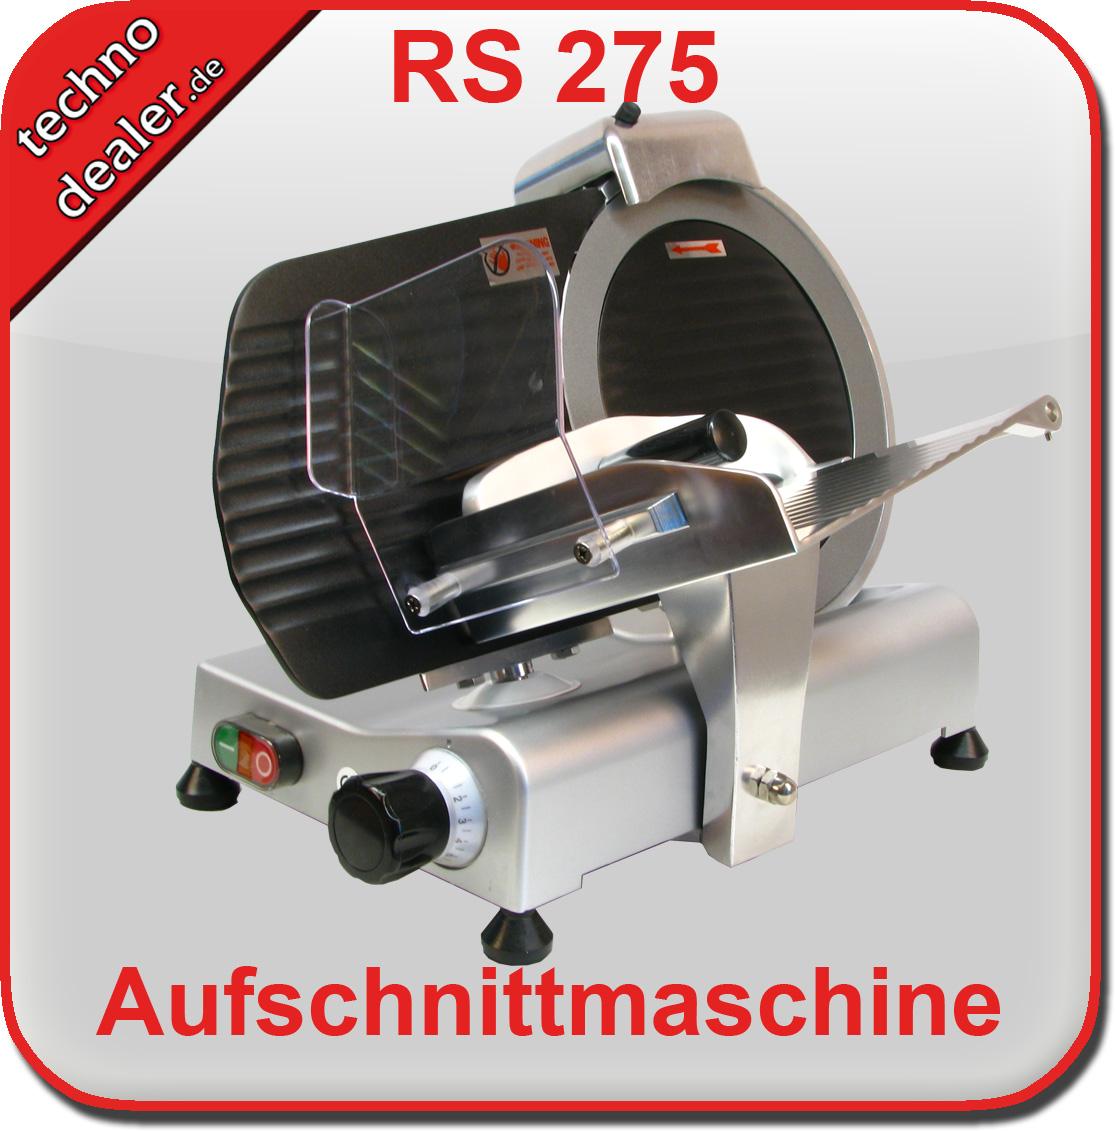 Aufschnittmaschine RS 275 teflon